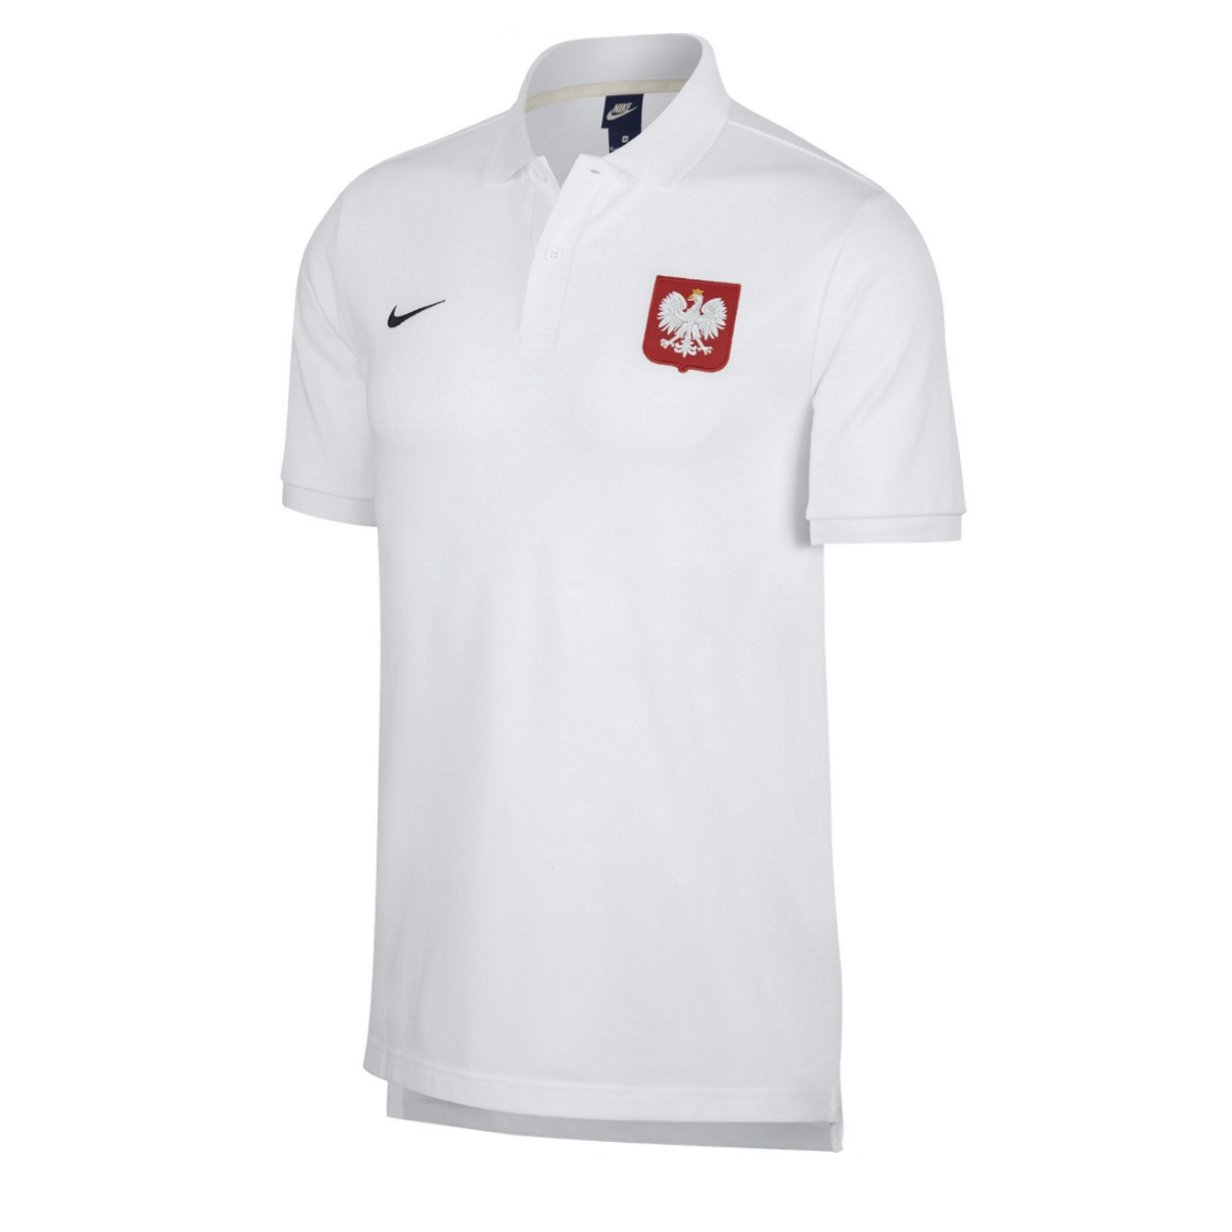 902b6b918 koszulka polo Nike Sportswear Poland 891482 102 || timsport.pl ...